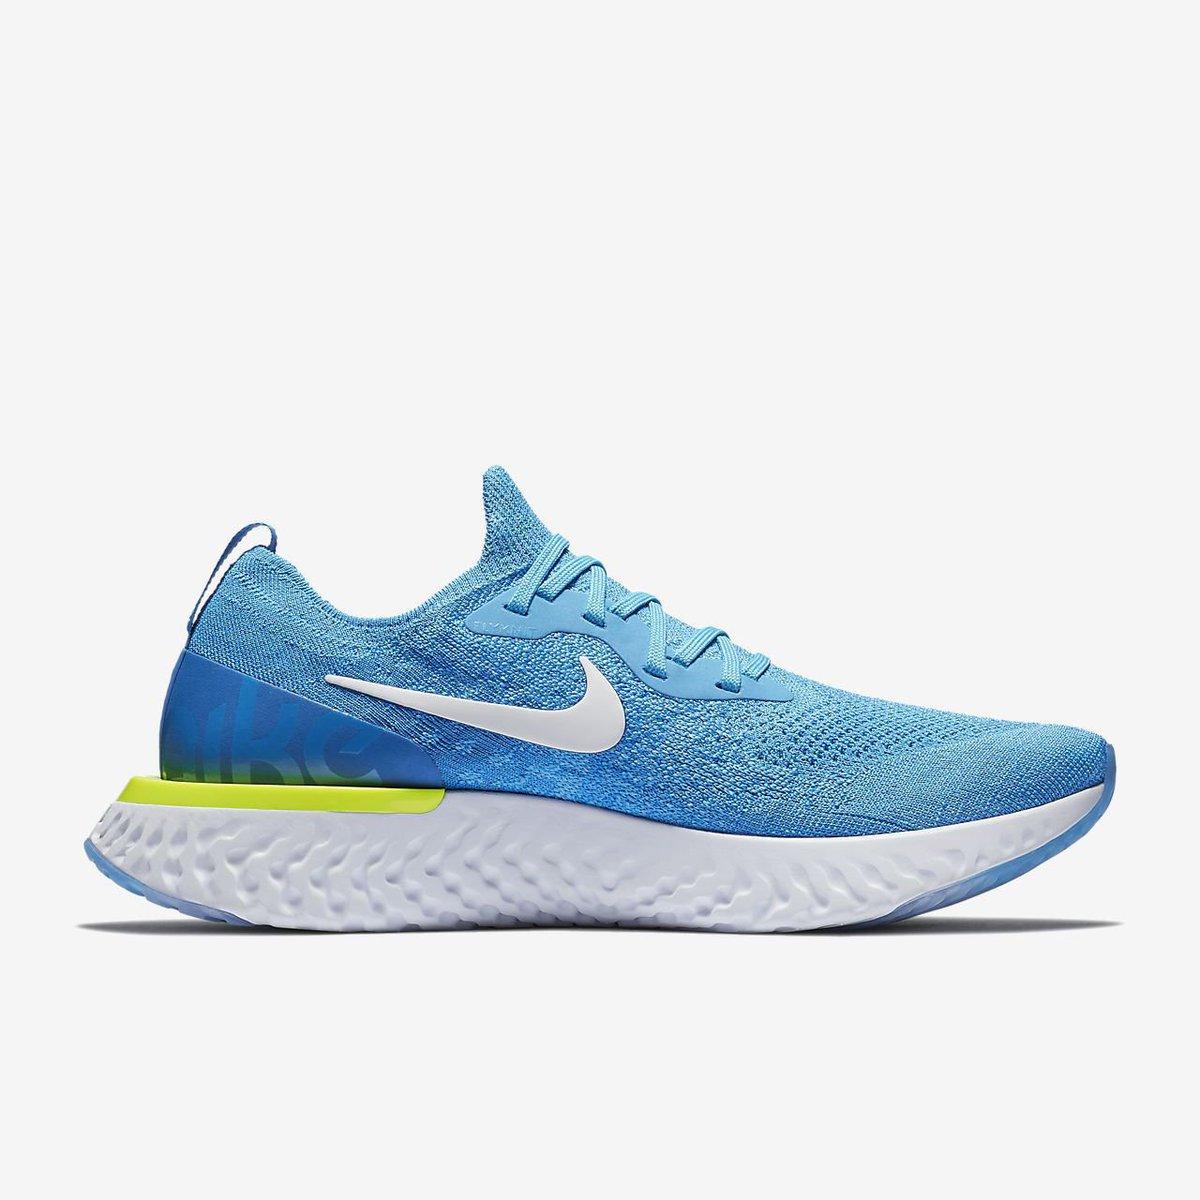 Cheap Nike AQ0070 601 Nike Epic React Flyknit Running Shoes Rust PinkHyper CrimsonBarely RoseRust Pink women men real Sneakers trainers best